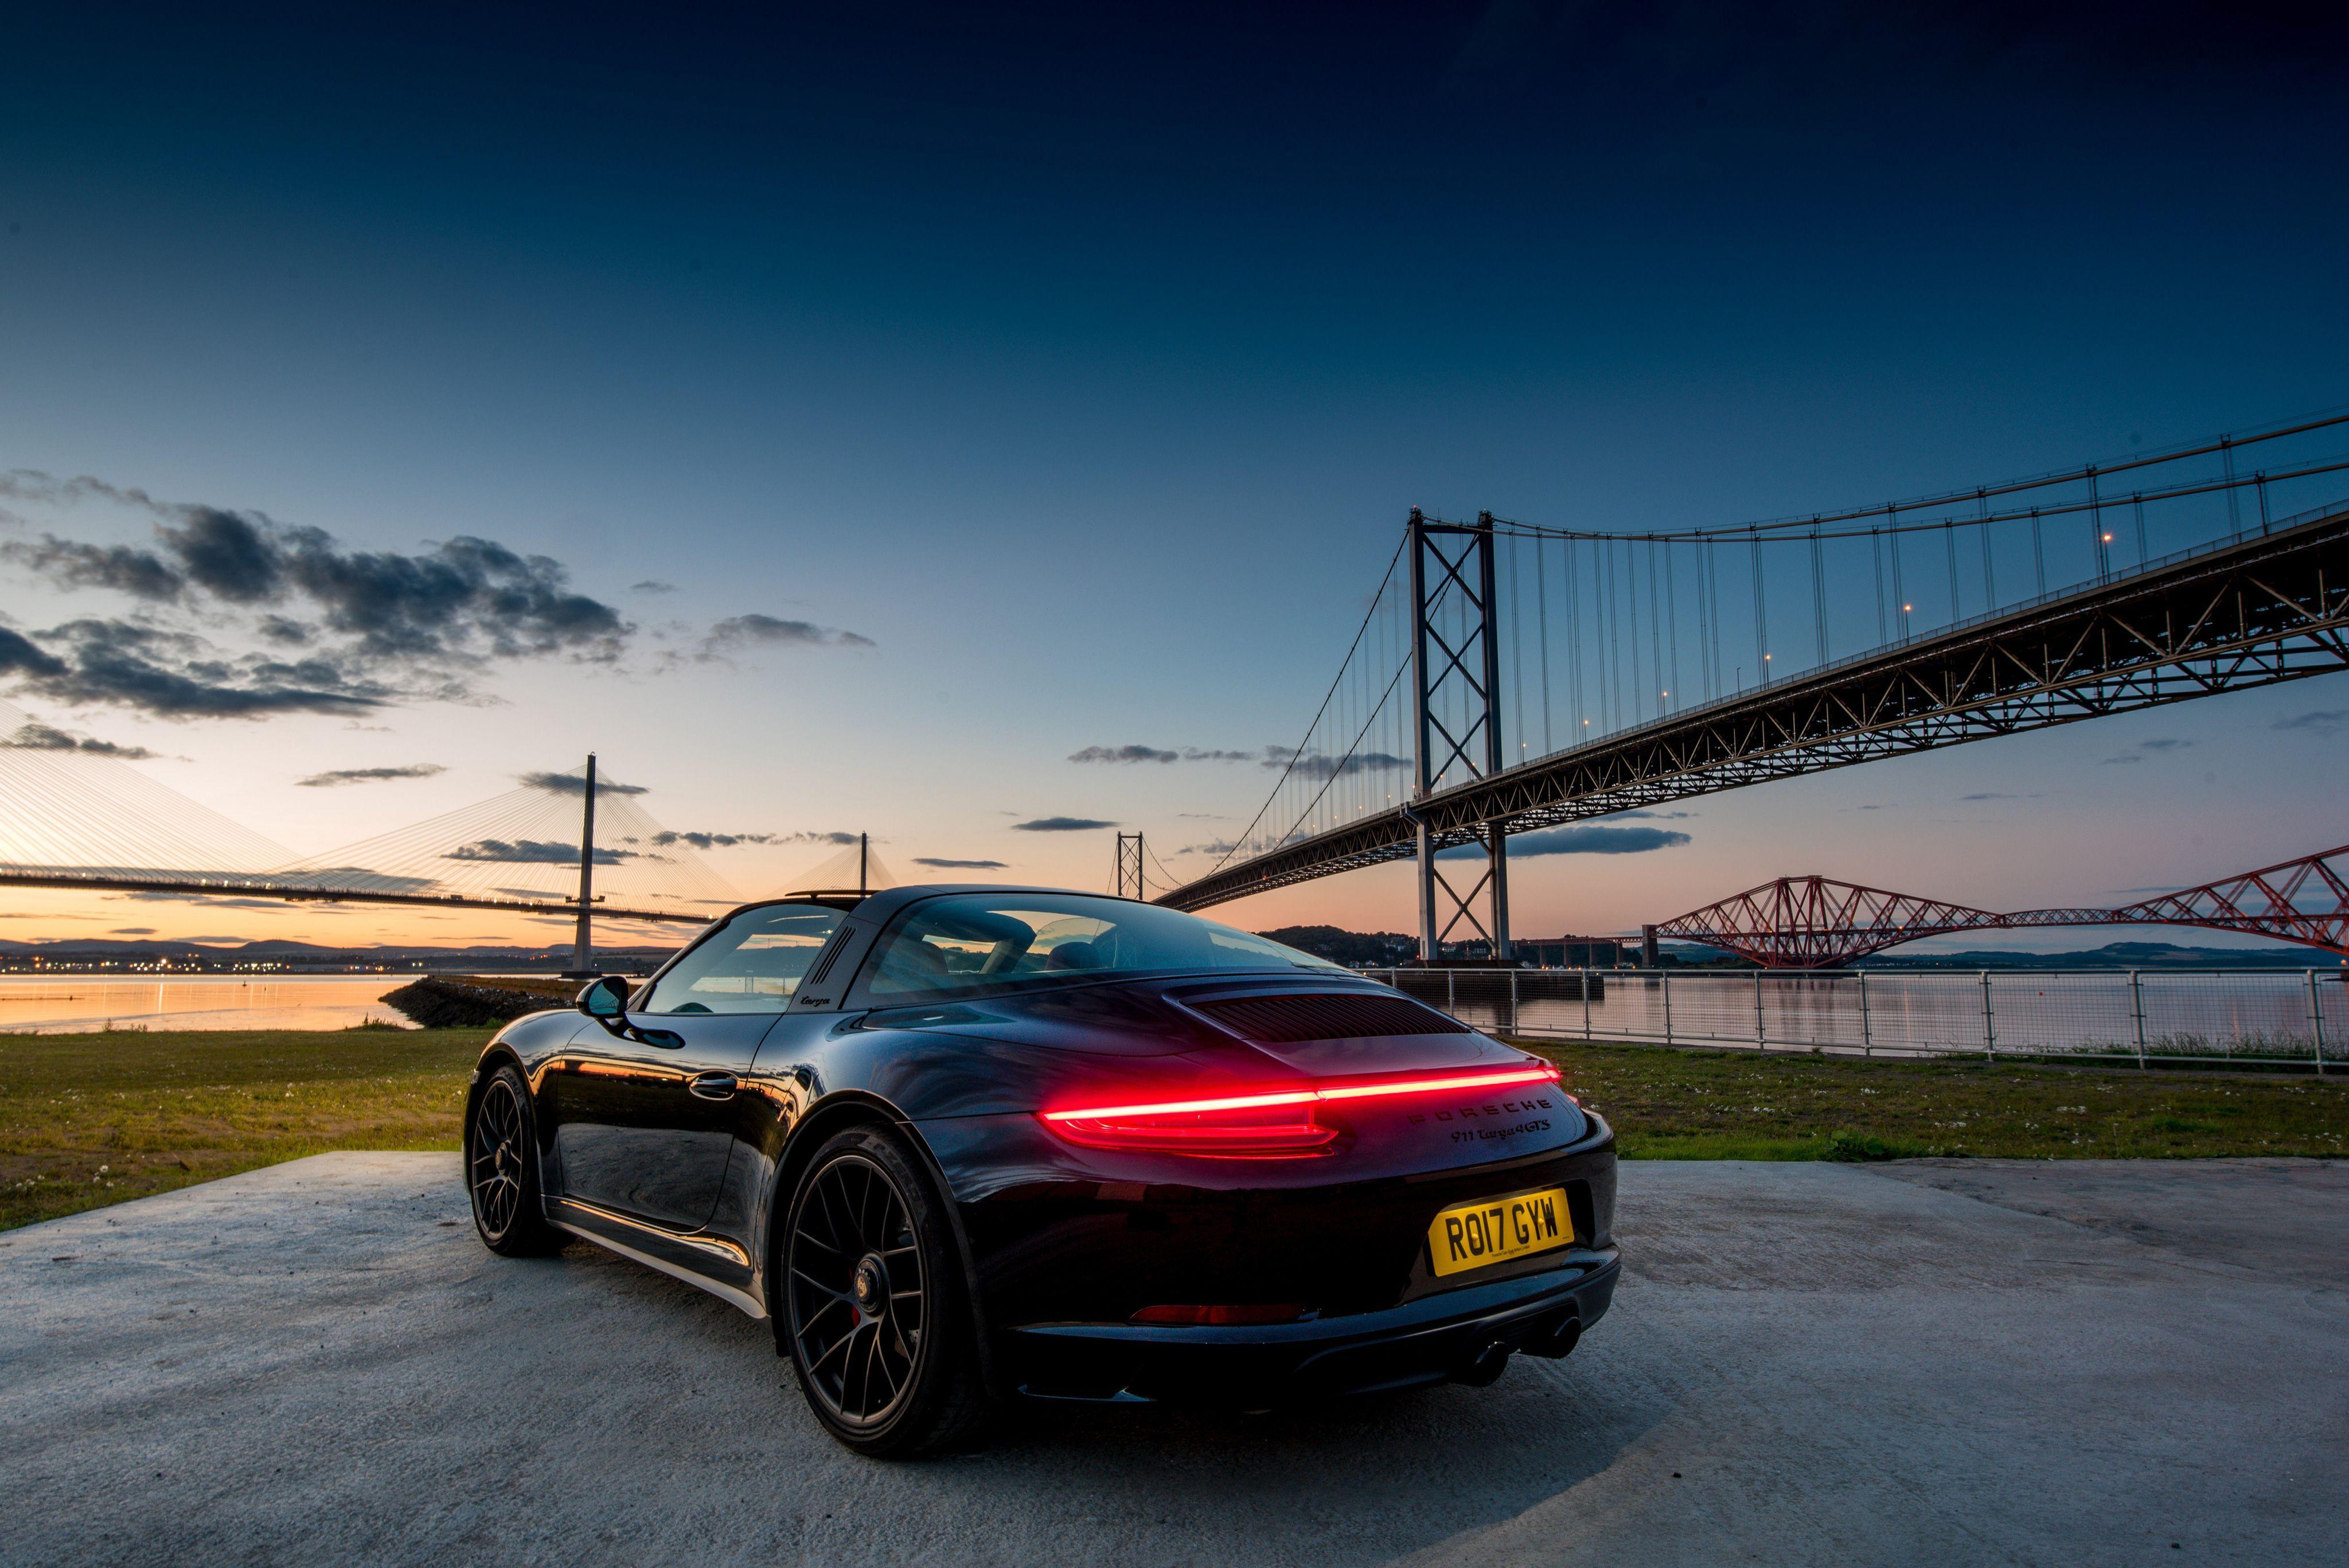 Porsche Targa Wallpapers Top Free Porsche Targa Backgrounds Wallpaperaccess